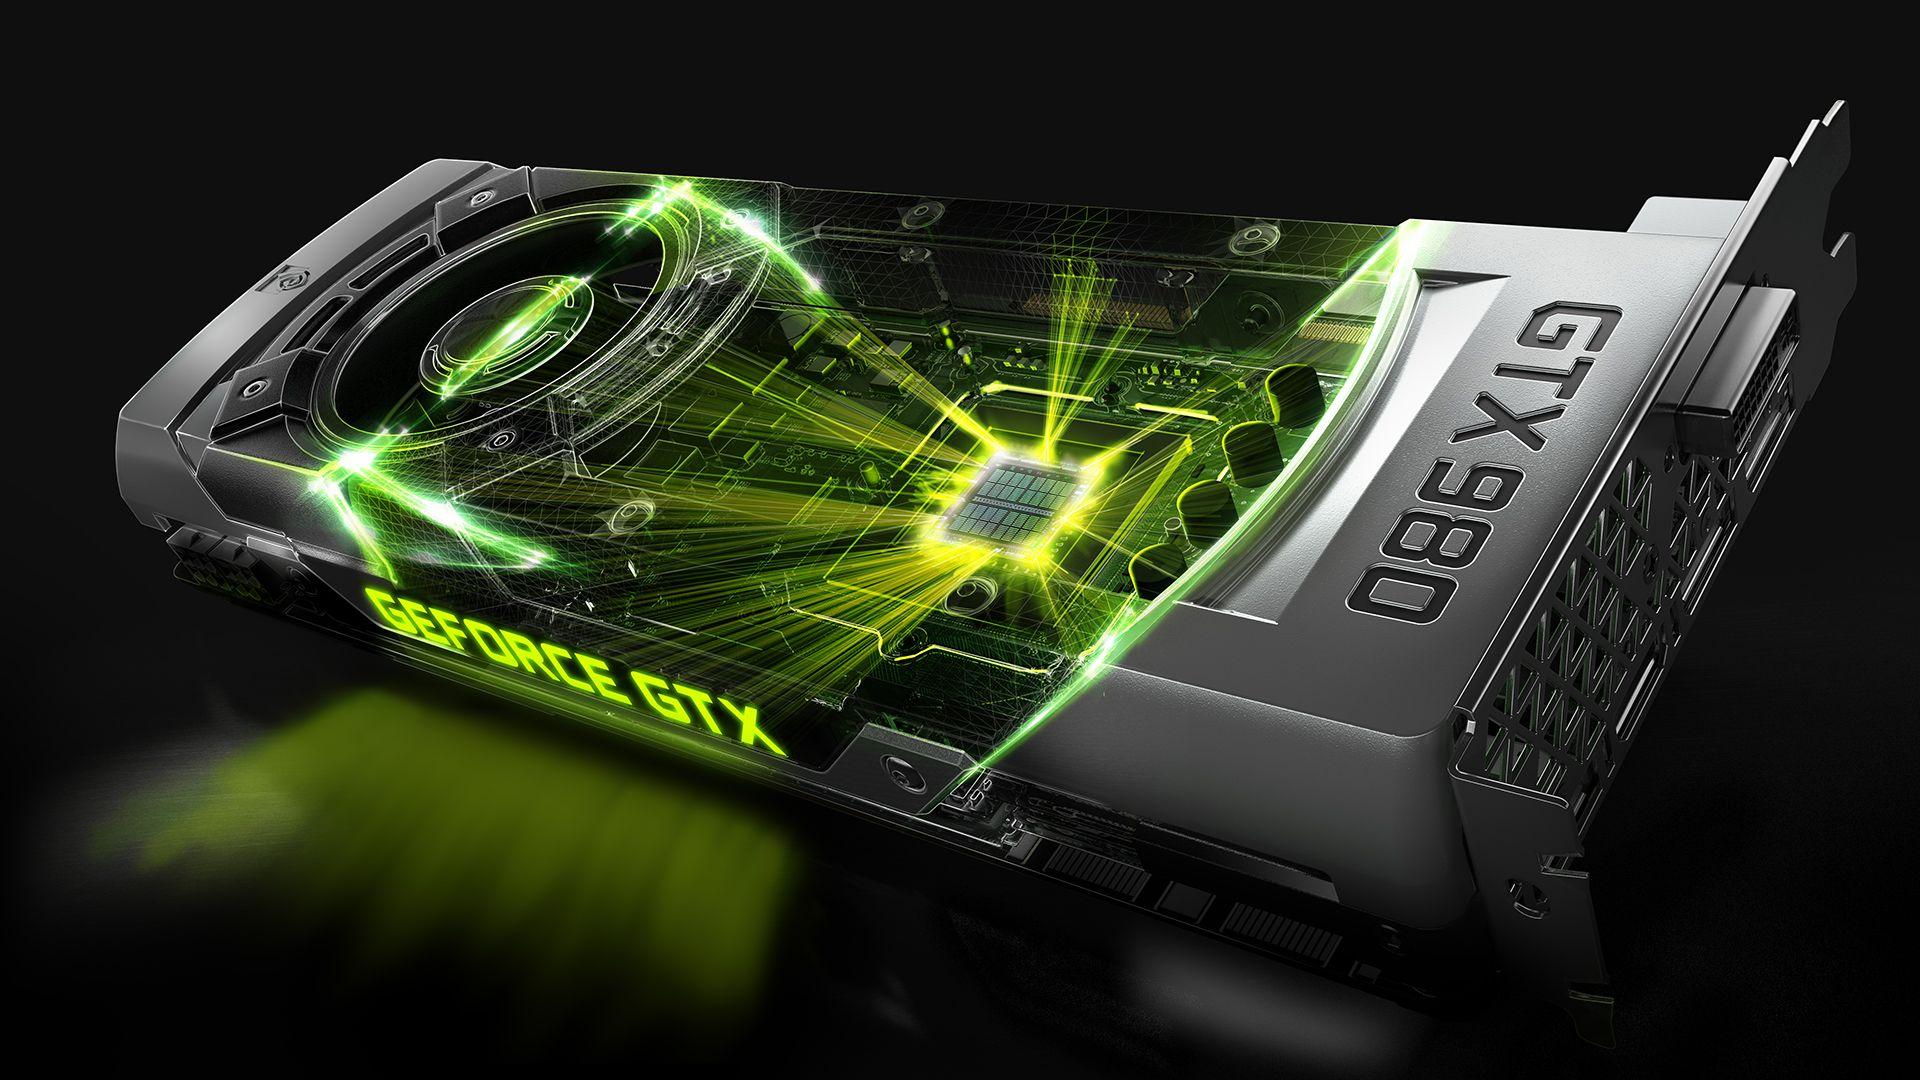 Nvidia geforce gtx 460 характеристики - b